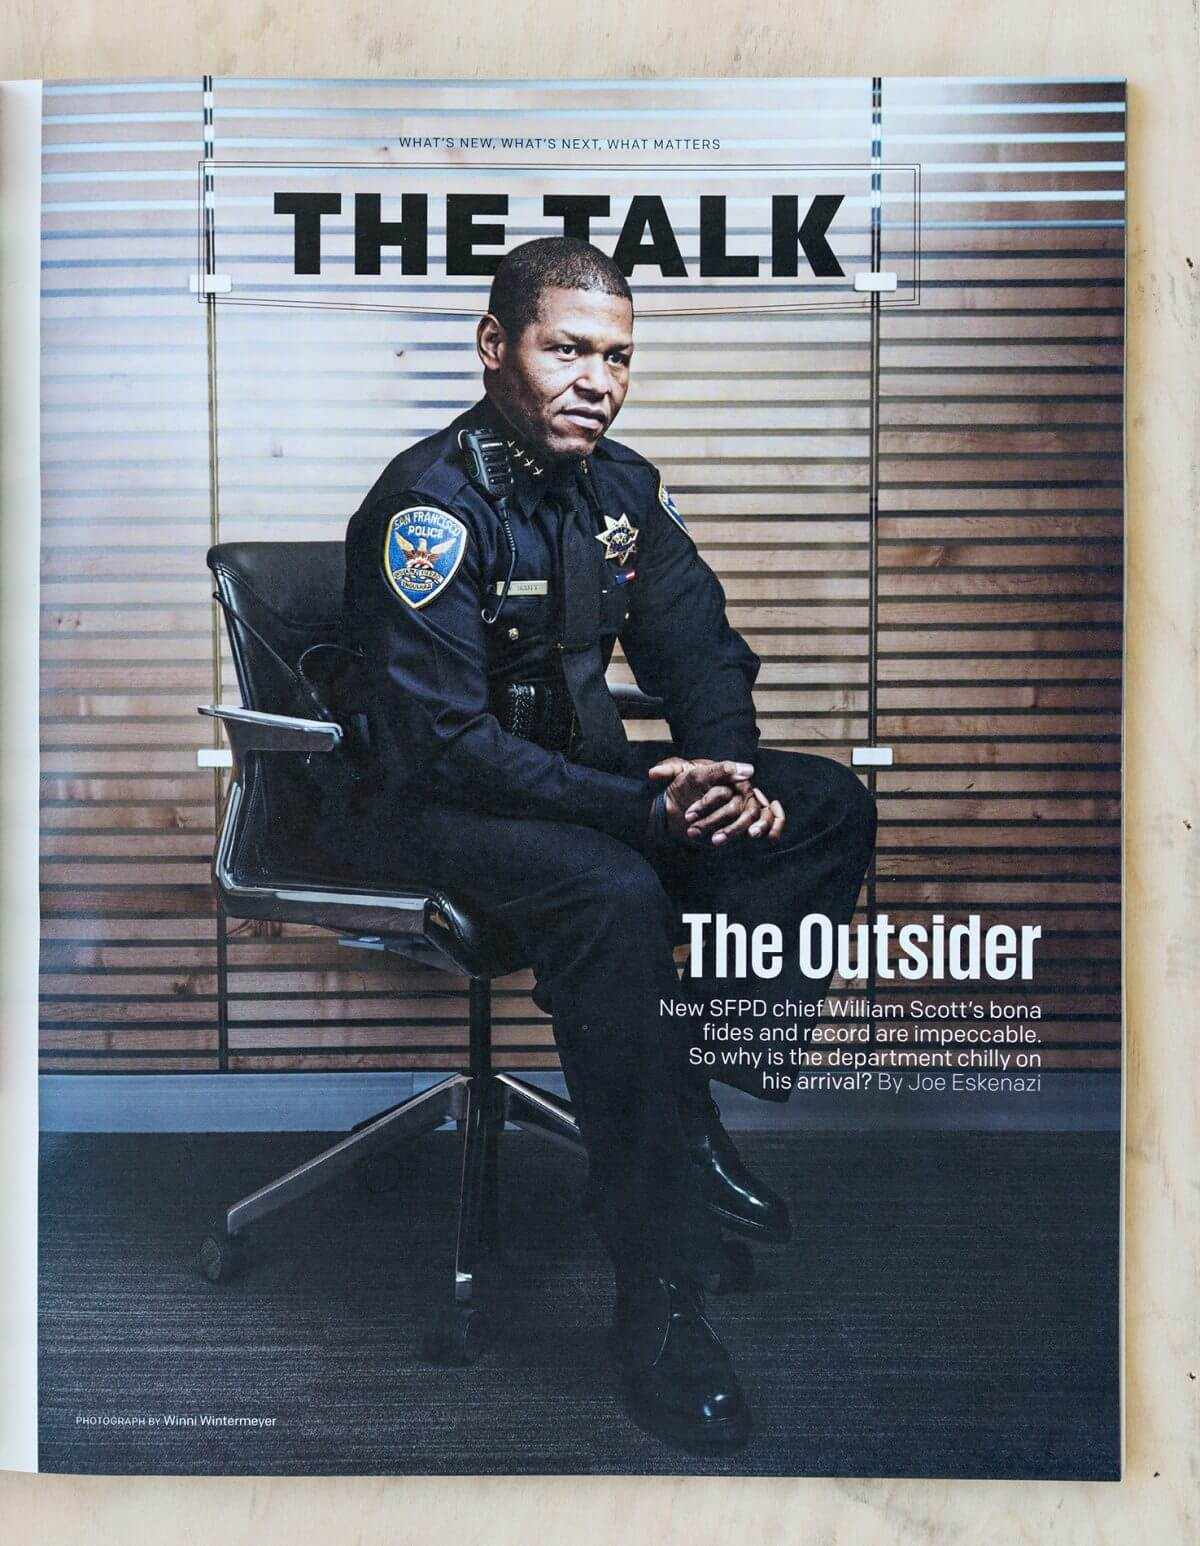 Police chief William Scott SFPD